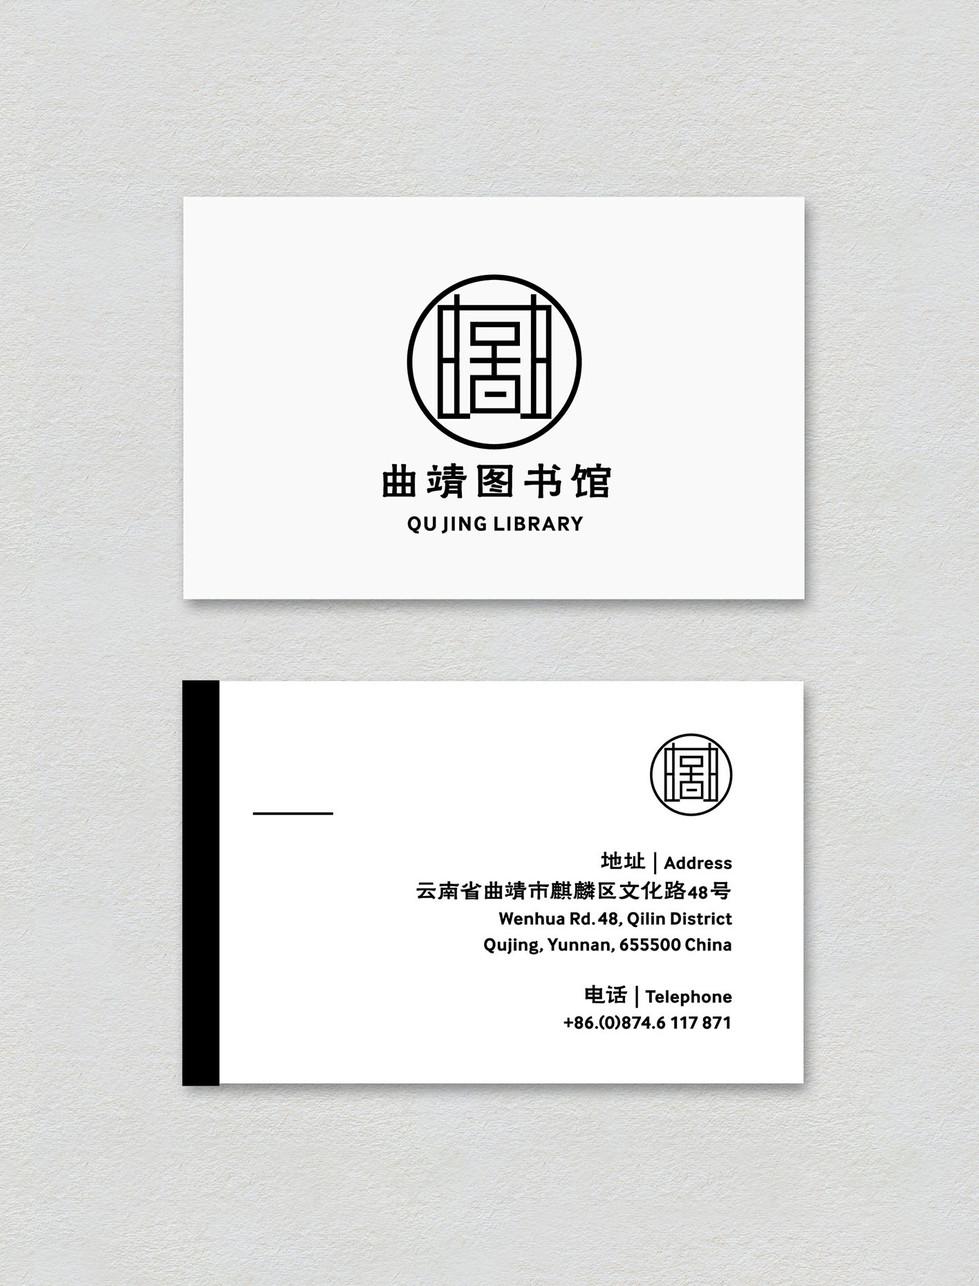 qujing library 01 72 WEB.jpg